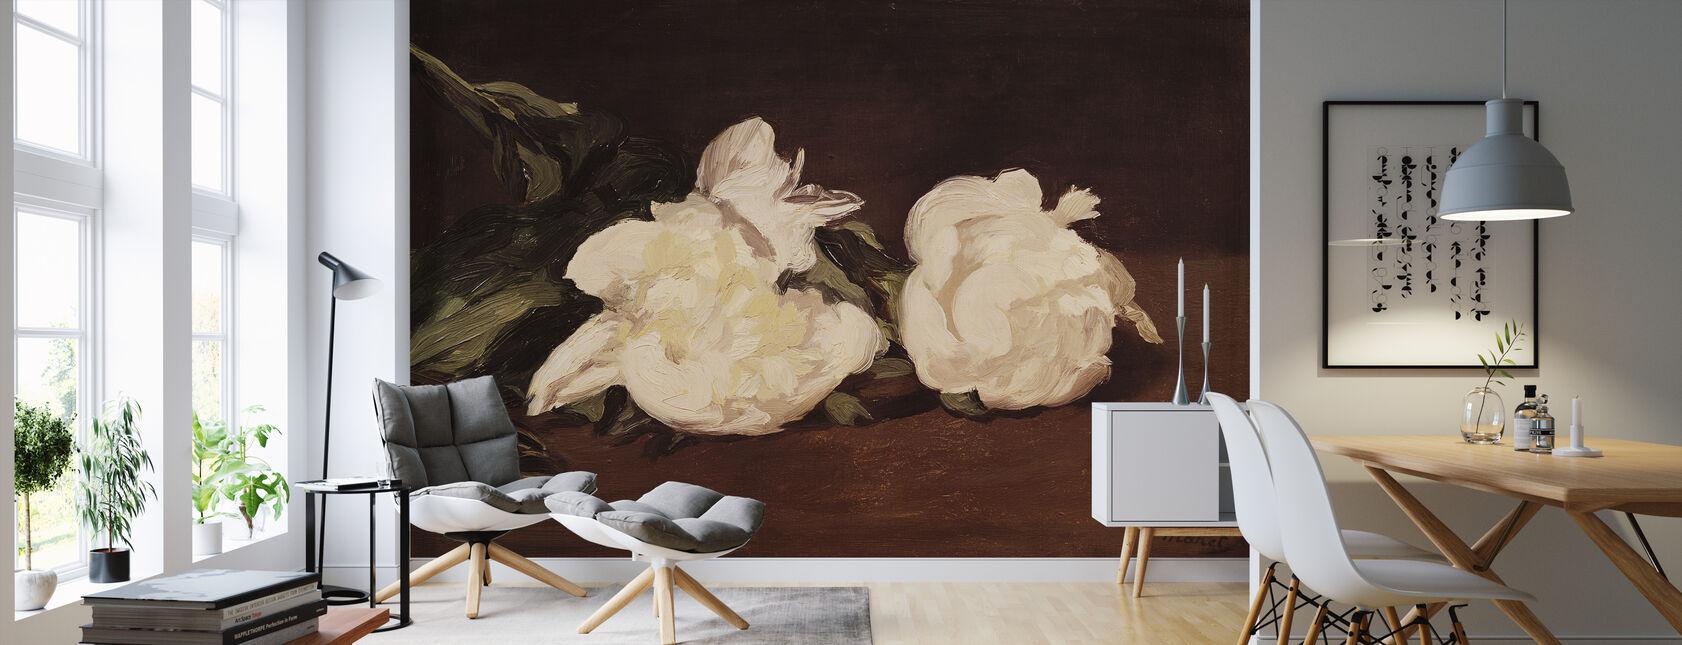 Branch of White Peonies, Edouard Manet - Wallpaper - Living Room